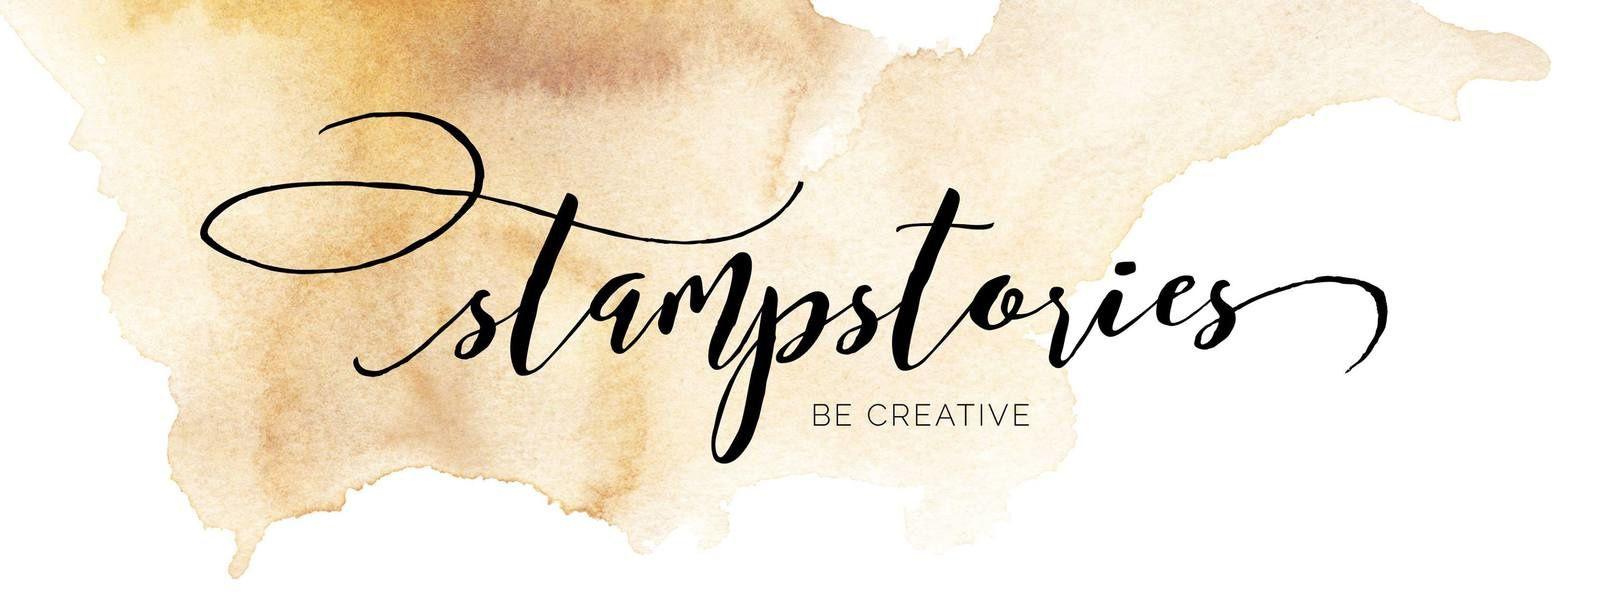 Stampstories 7 Vacances et Voyages